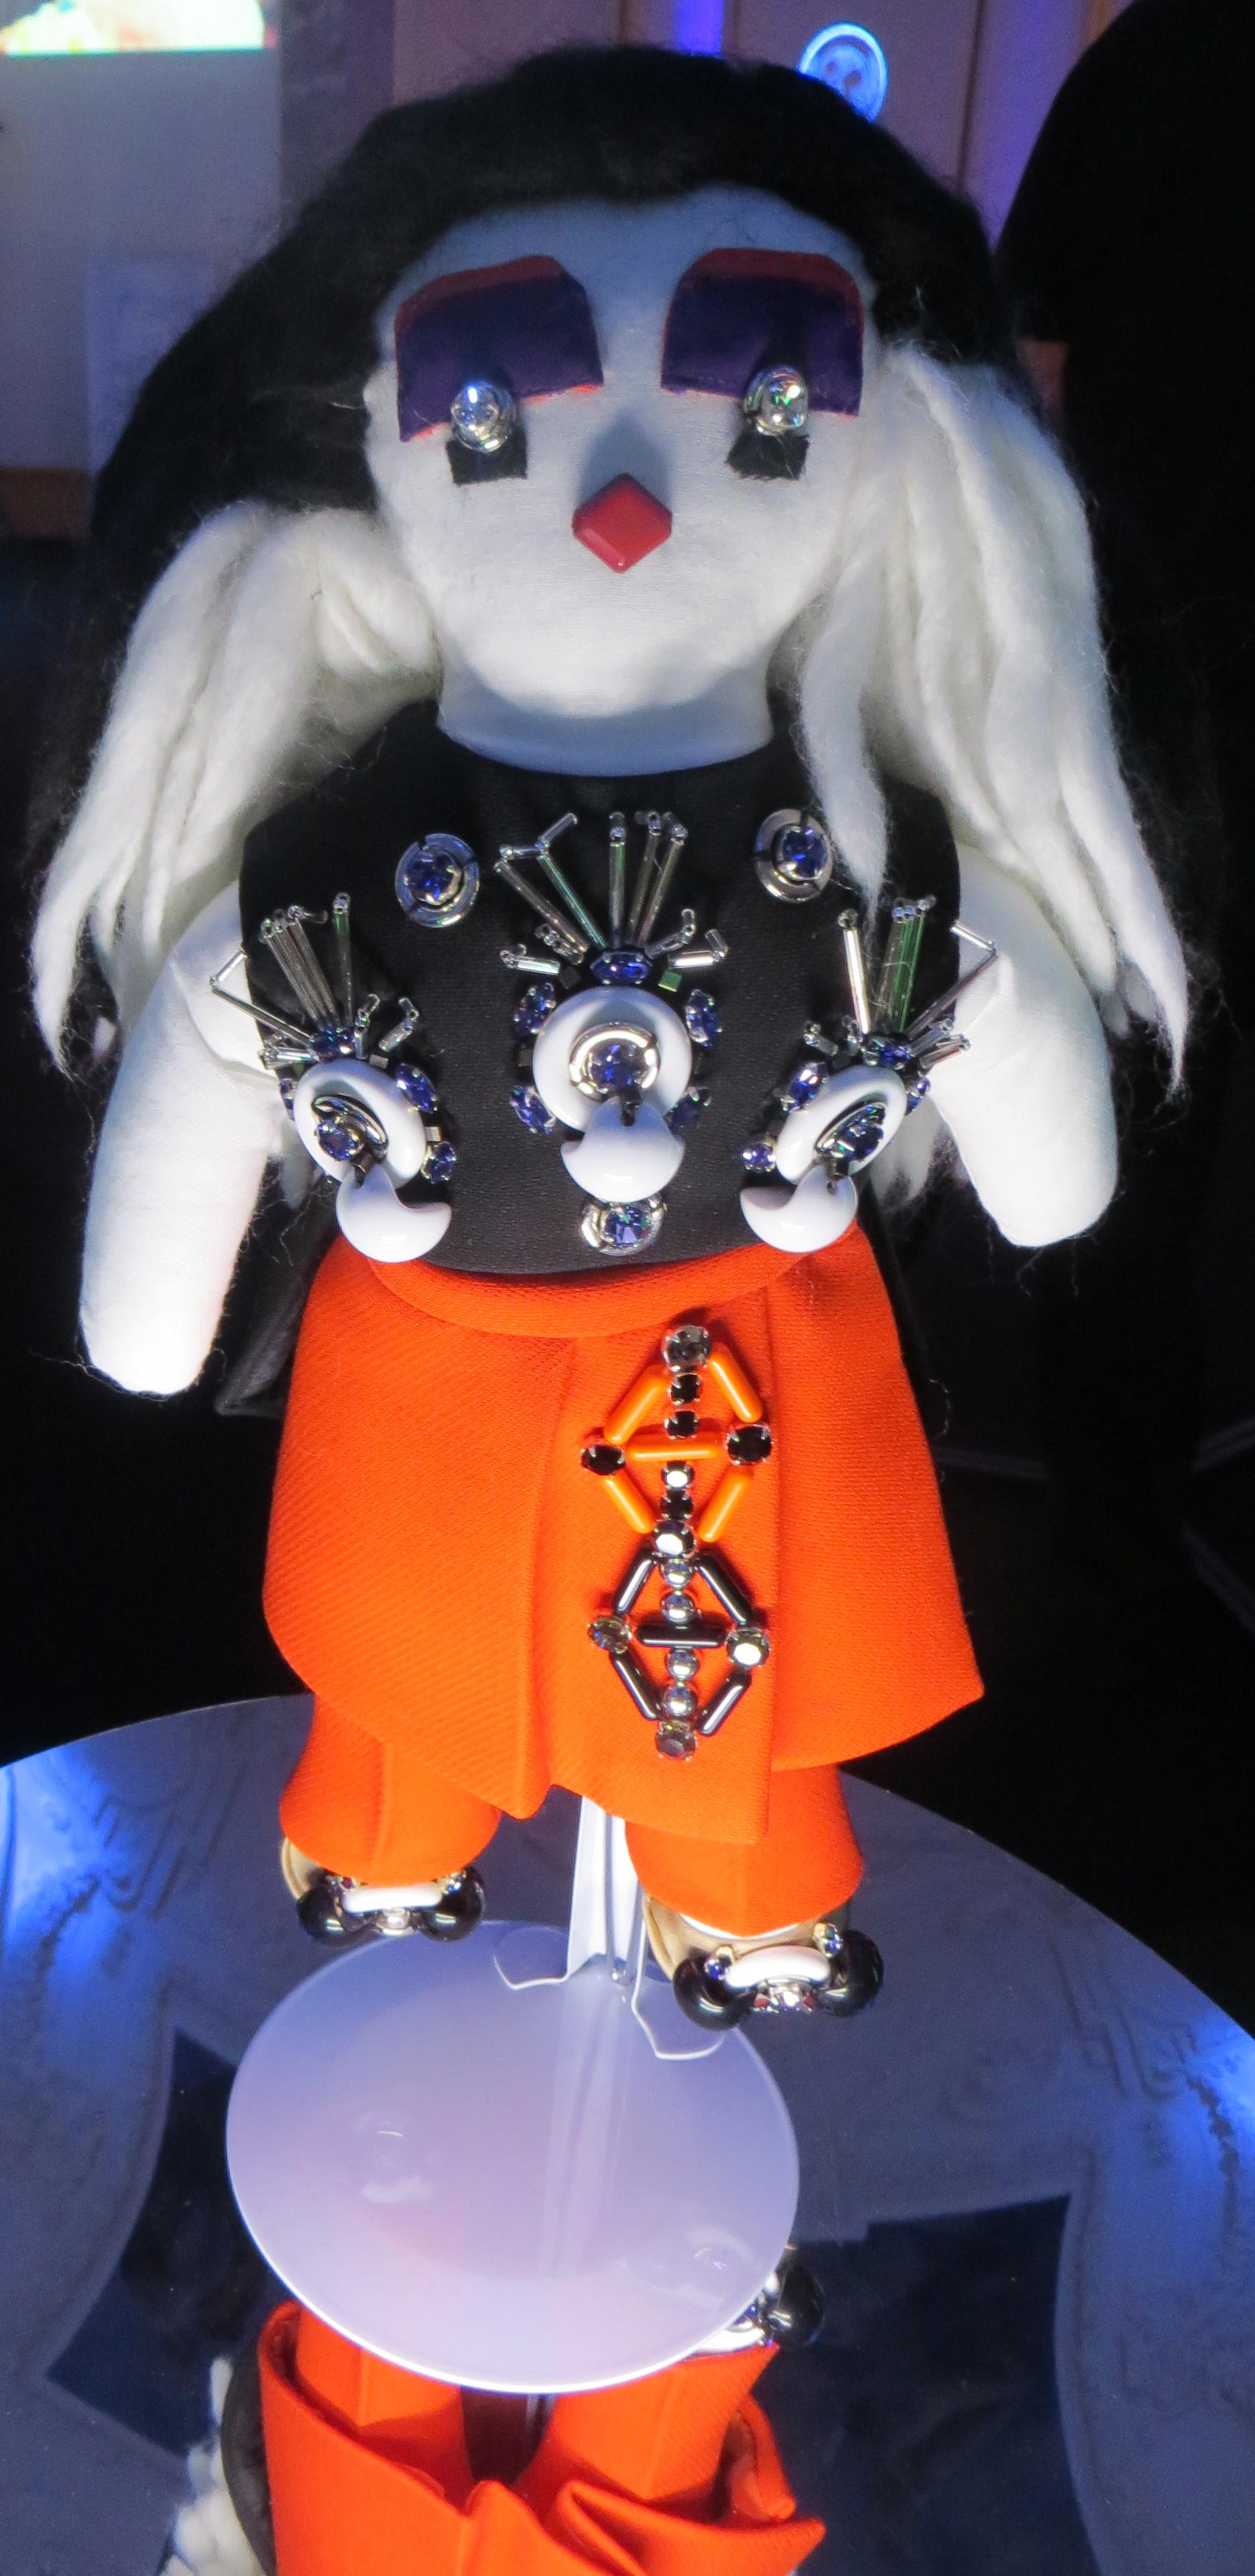 Prada doll 2012